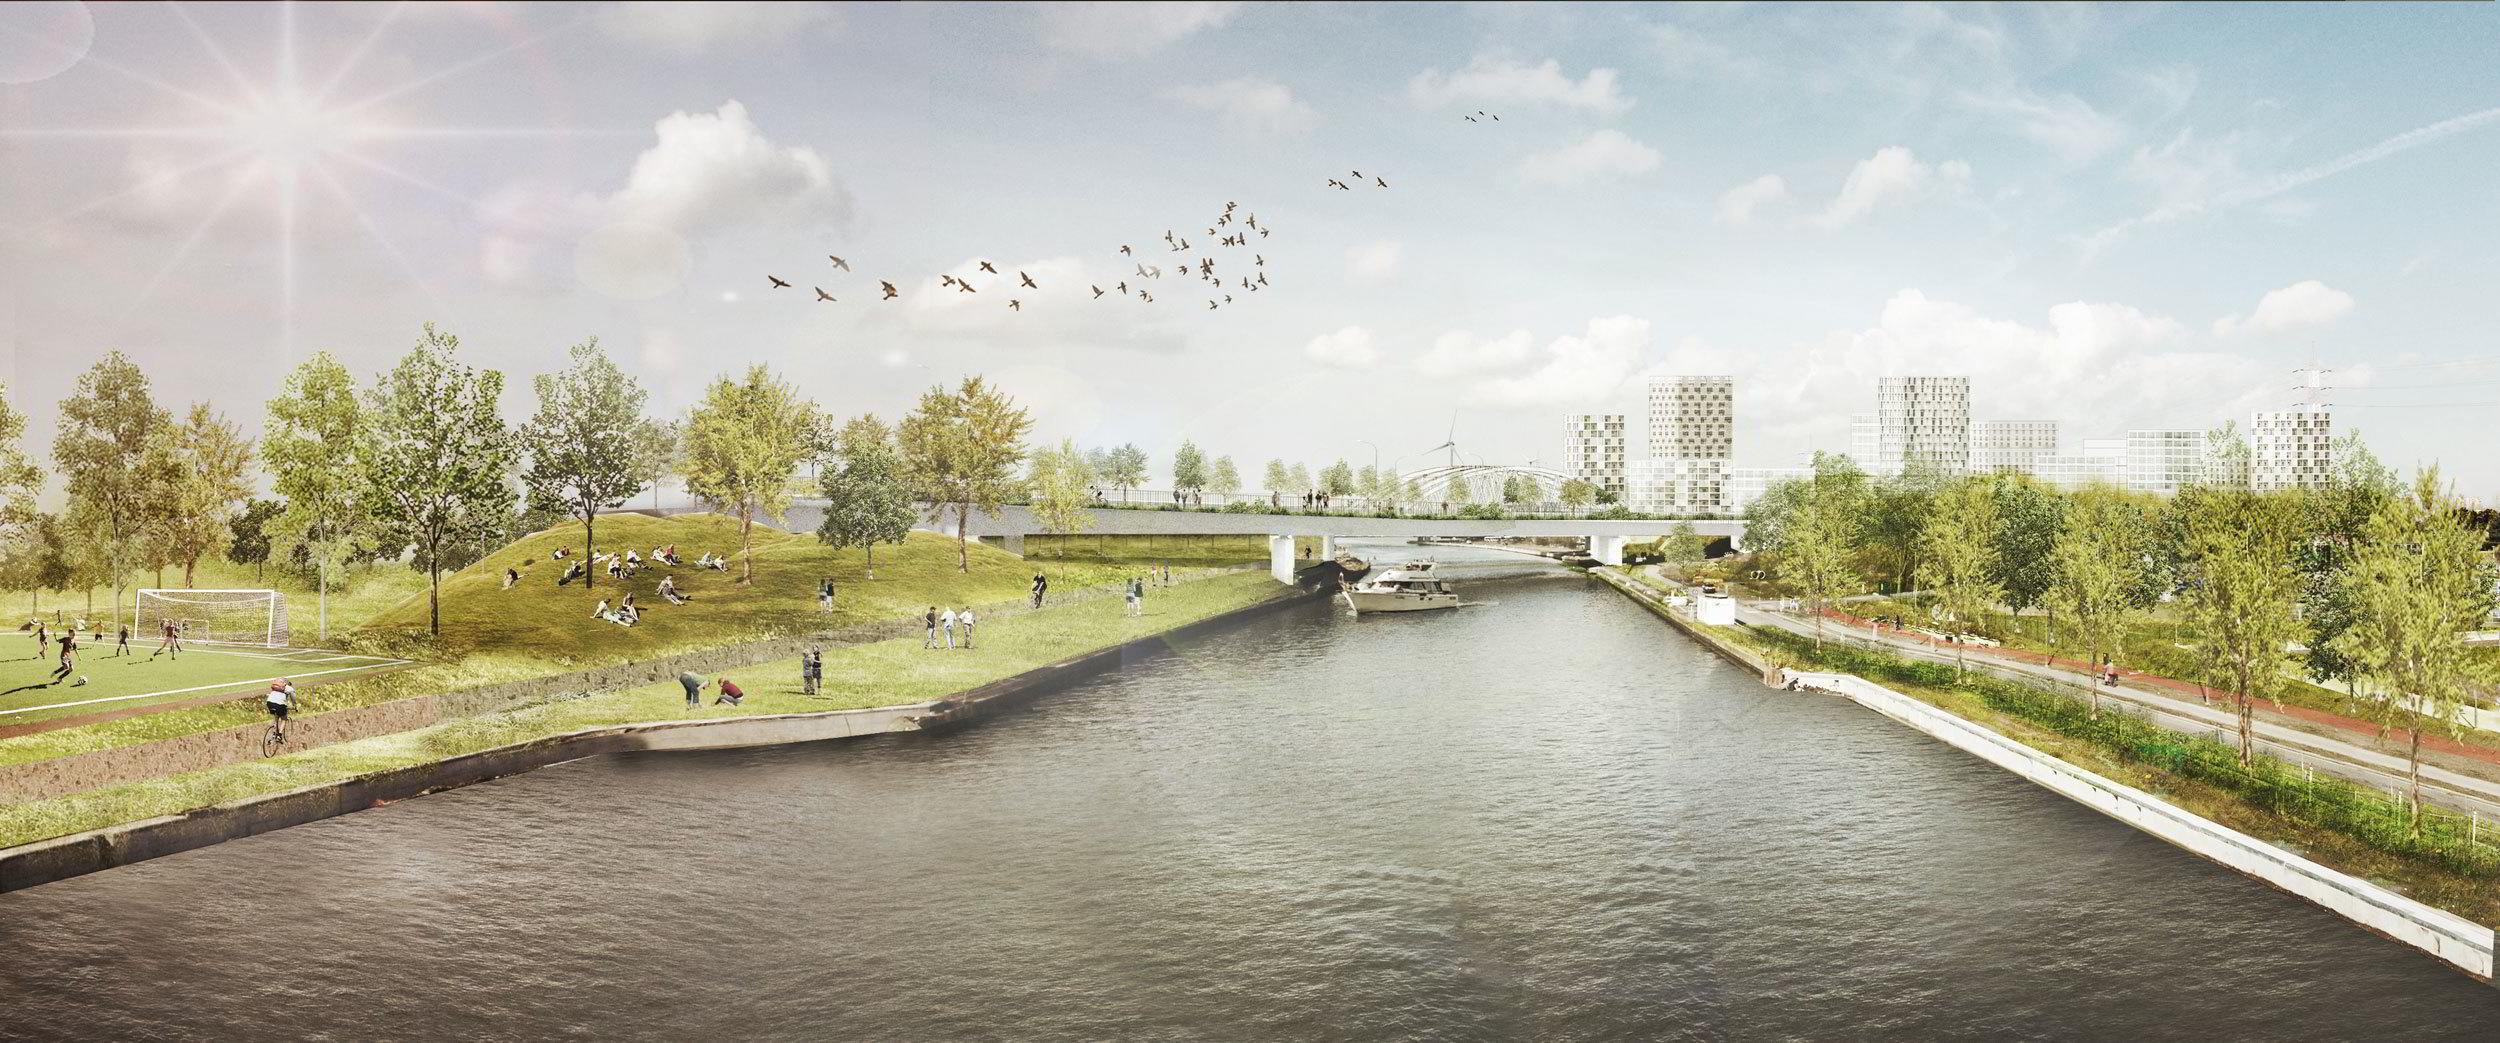 thumb_20180504-collage-viaduct-vanaf-fietsbrug-hill-_-with-facades-(RT-DB_online.jpg